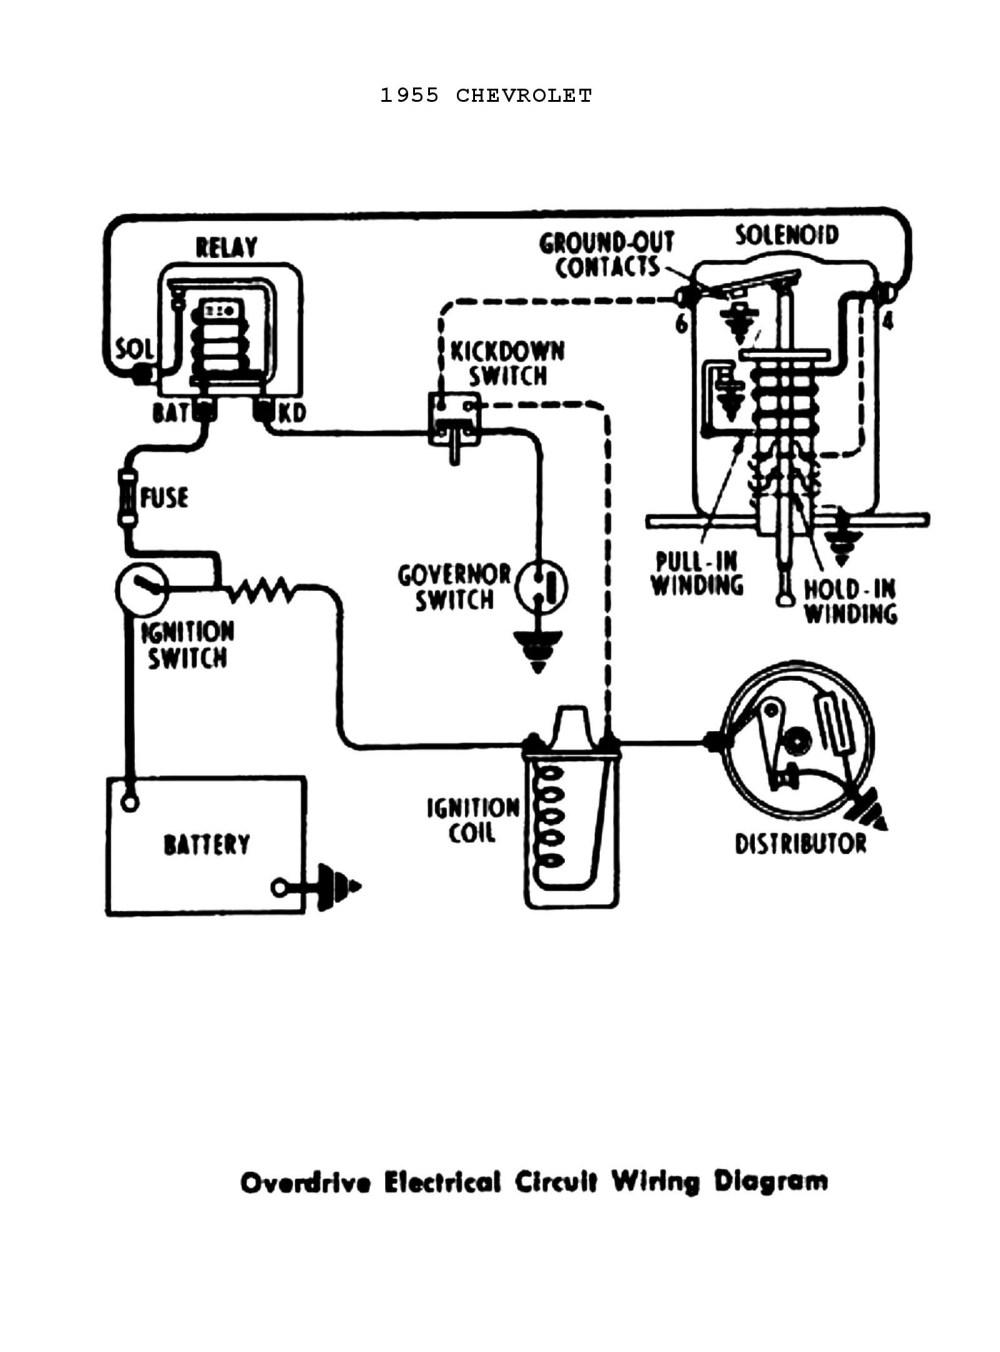 medium resolution of chevy colorado wiring diagram 1955 power windows seats 1955 overdrive circuit 19m